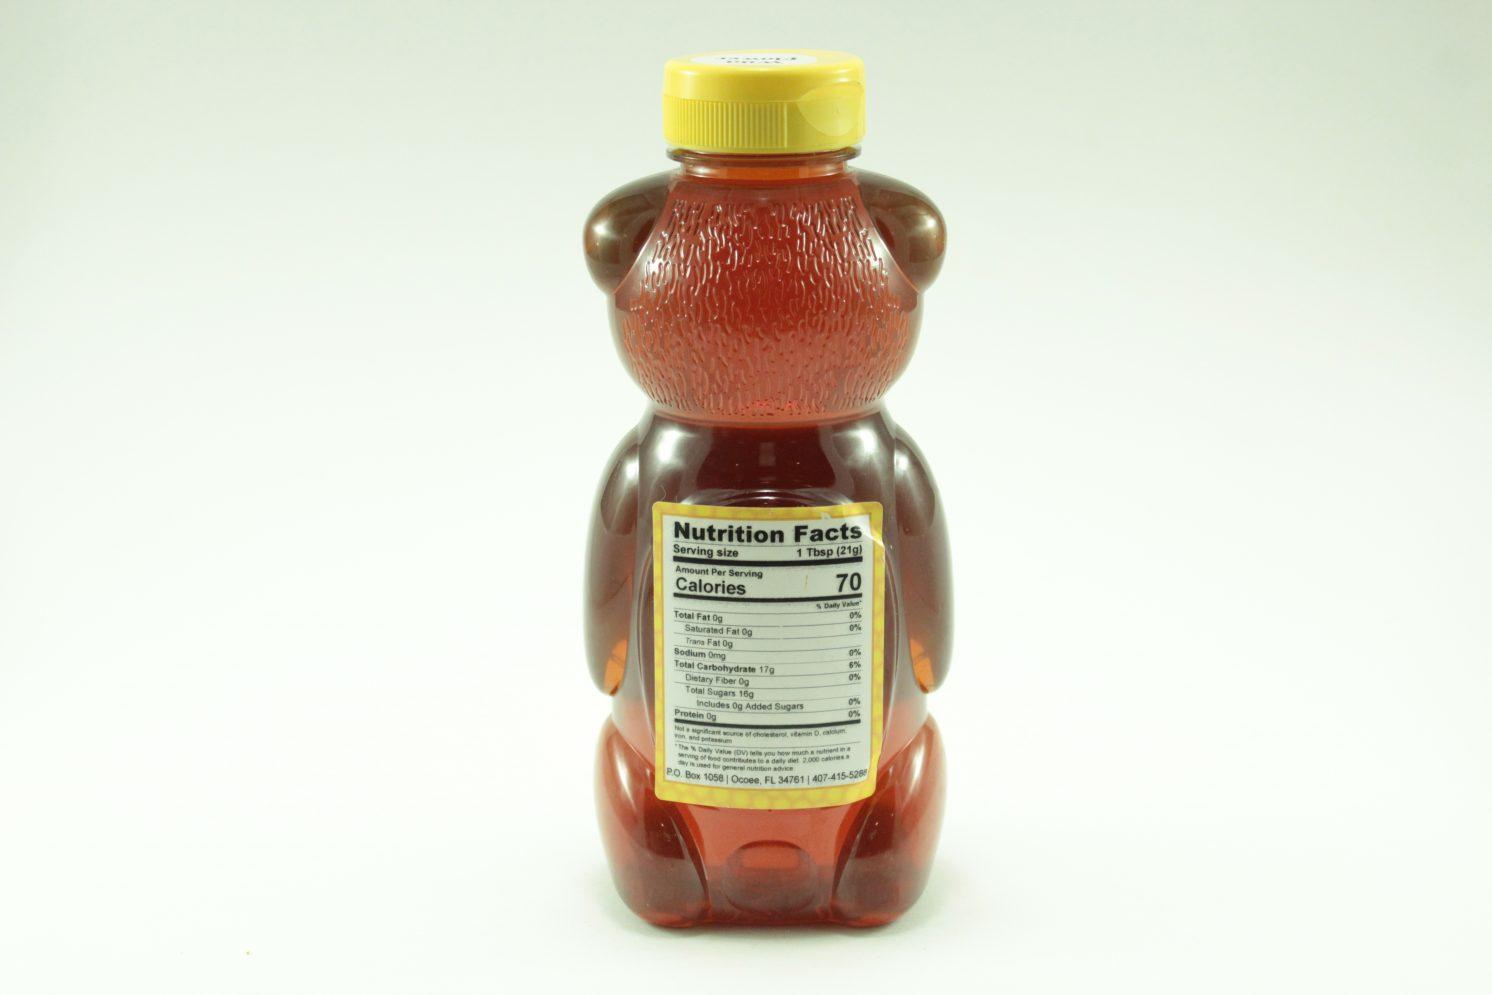 Florida Summer Wild Flower Honey - 24 oz - Back